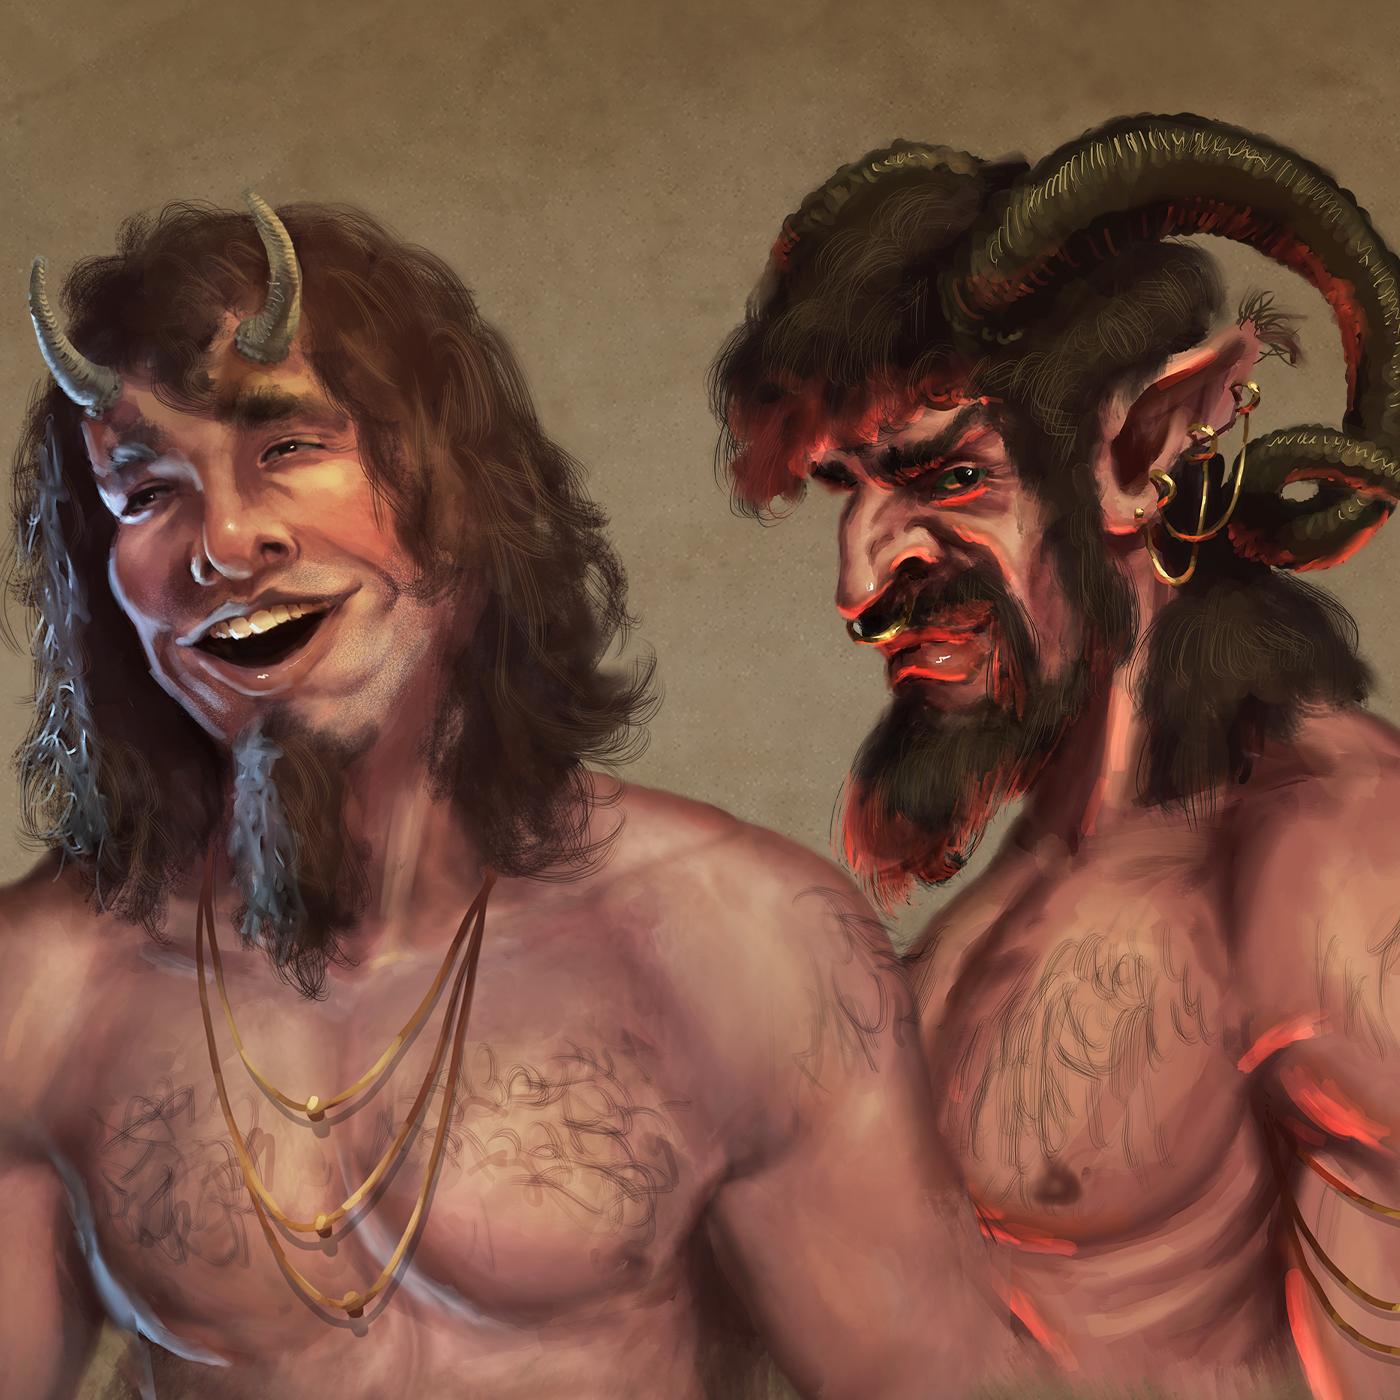 Episode 17: Satyrs & Fauns - The Goatmen of Greek & Roman Mythology